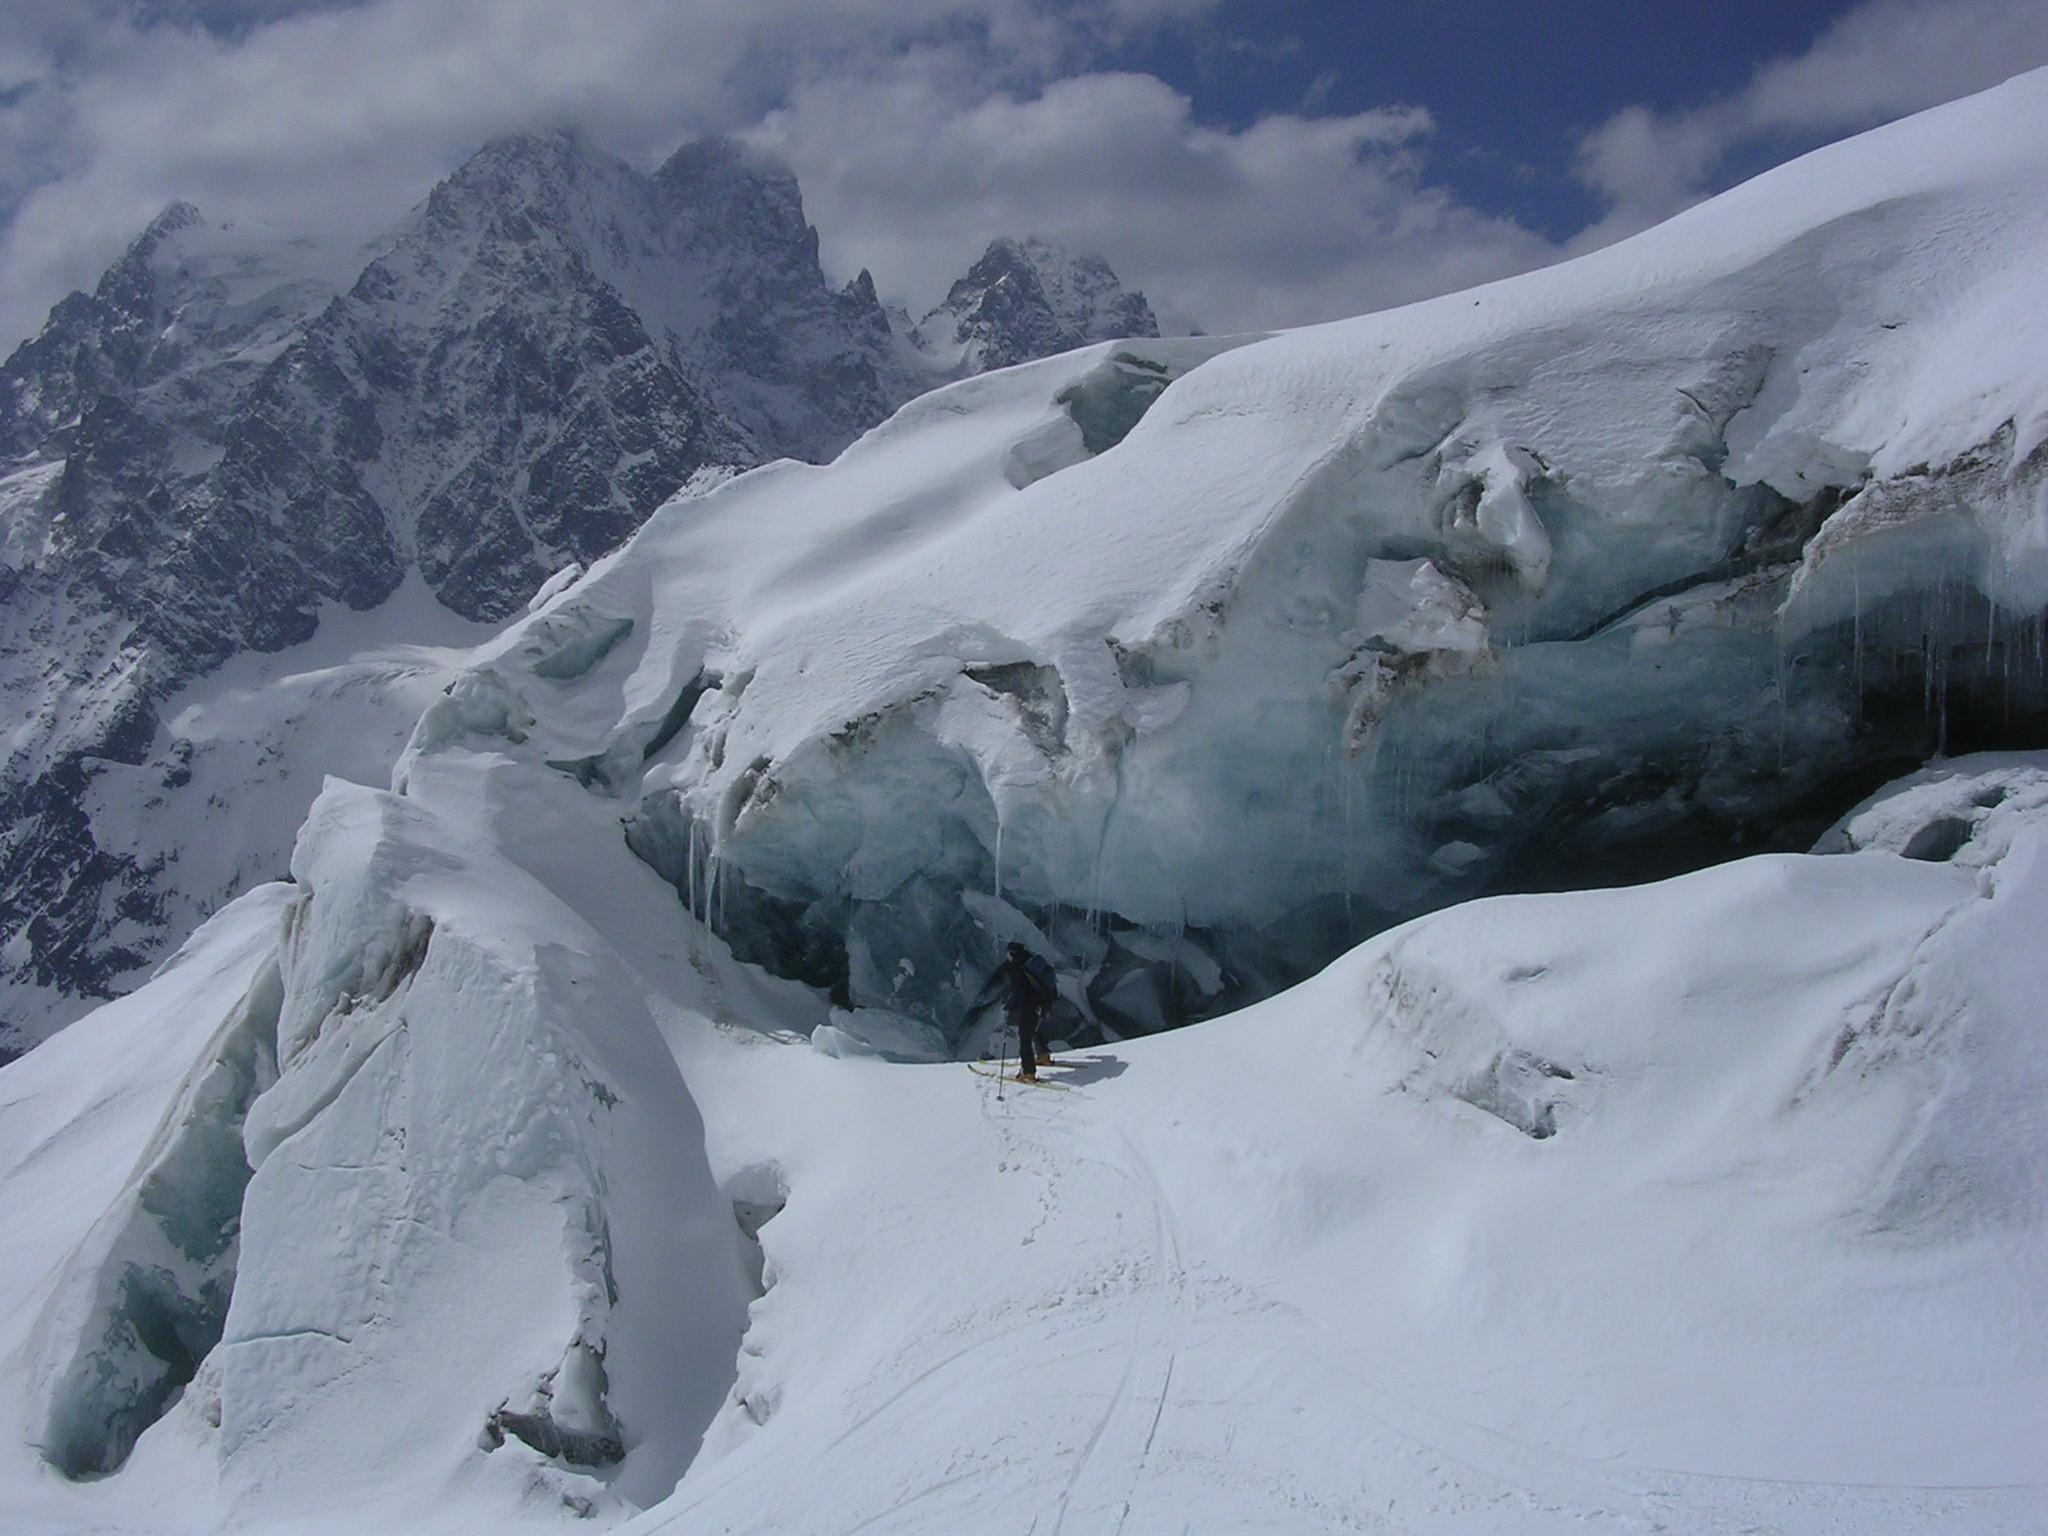 Ski près des crevasses